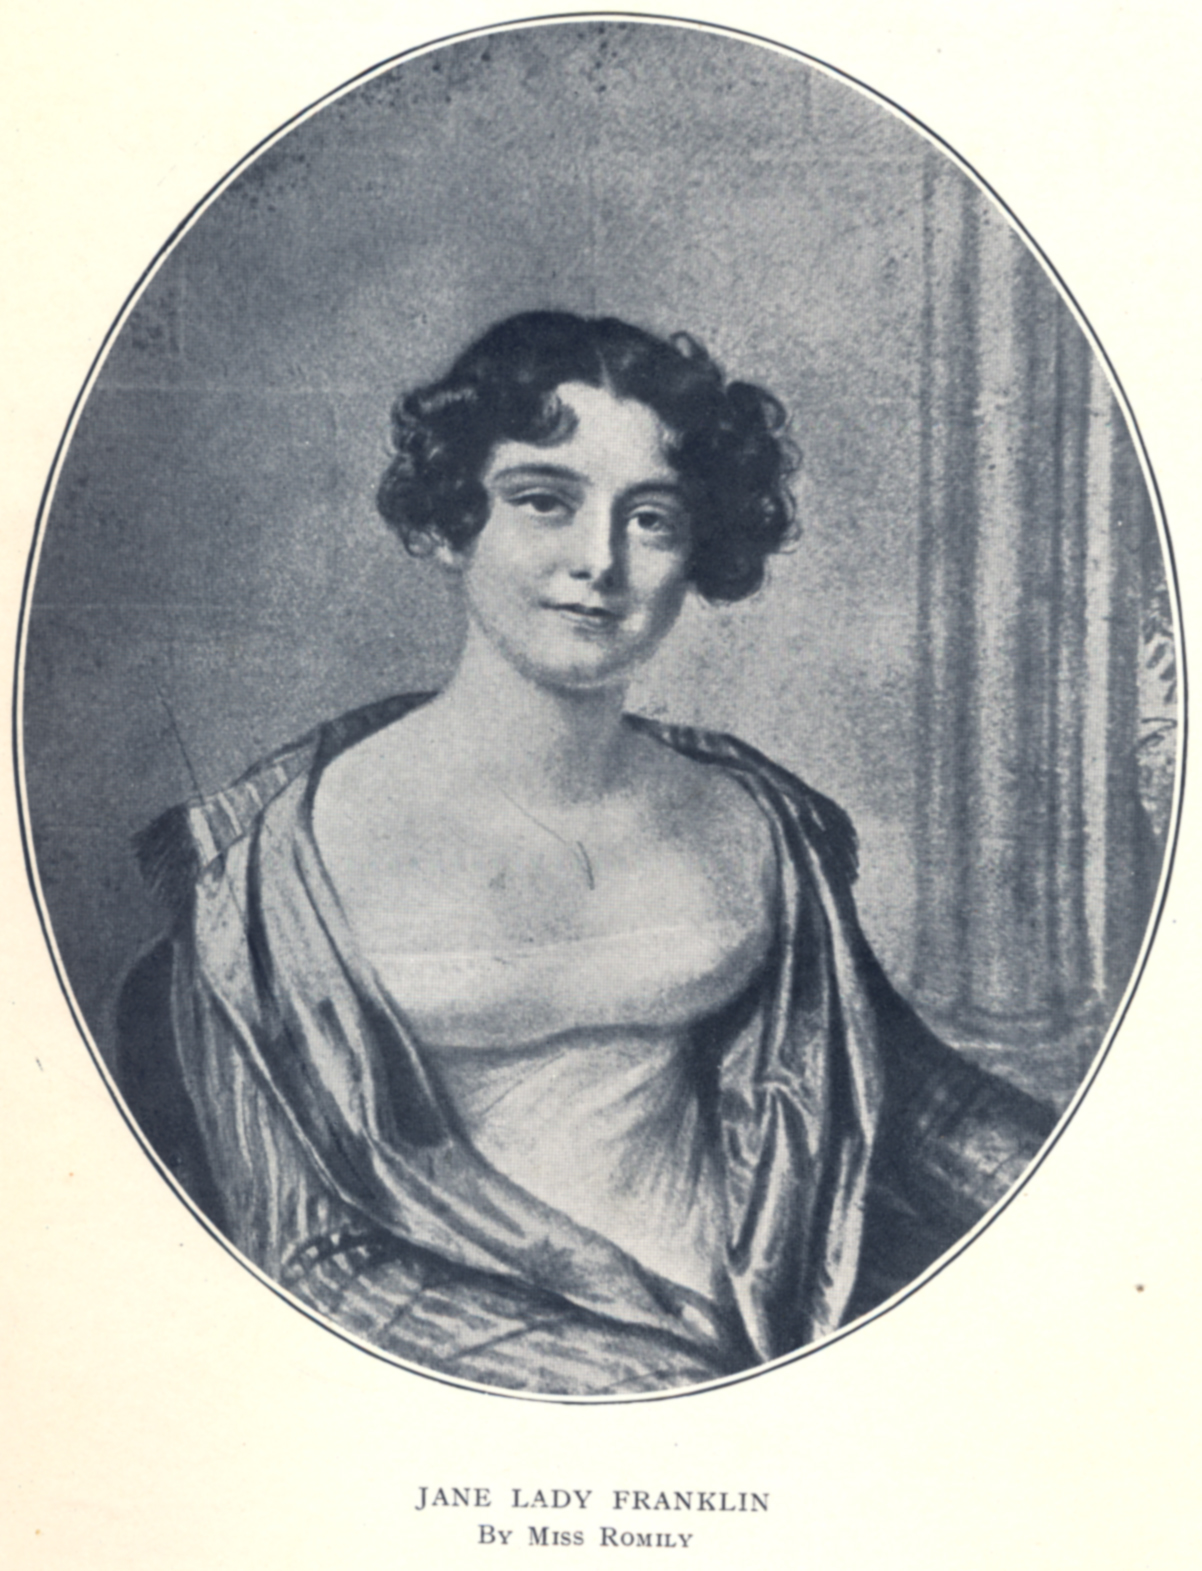 Diaries of Jane, Lady Franklin, Van Diemen's Land 1838 and Victoria, Australia 1843-1844